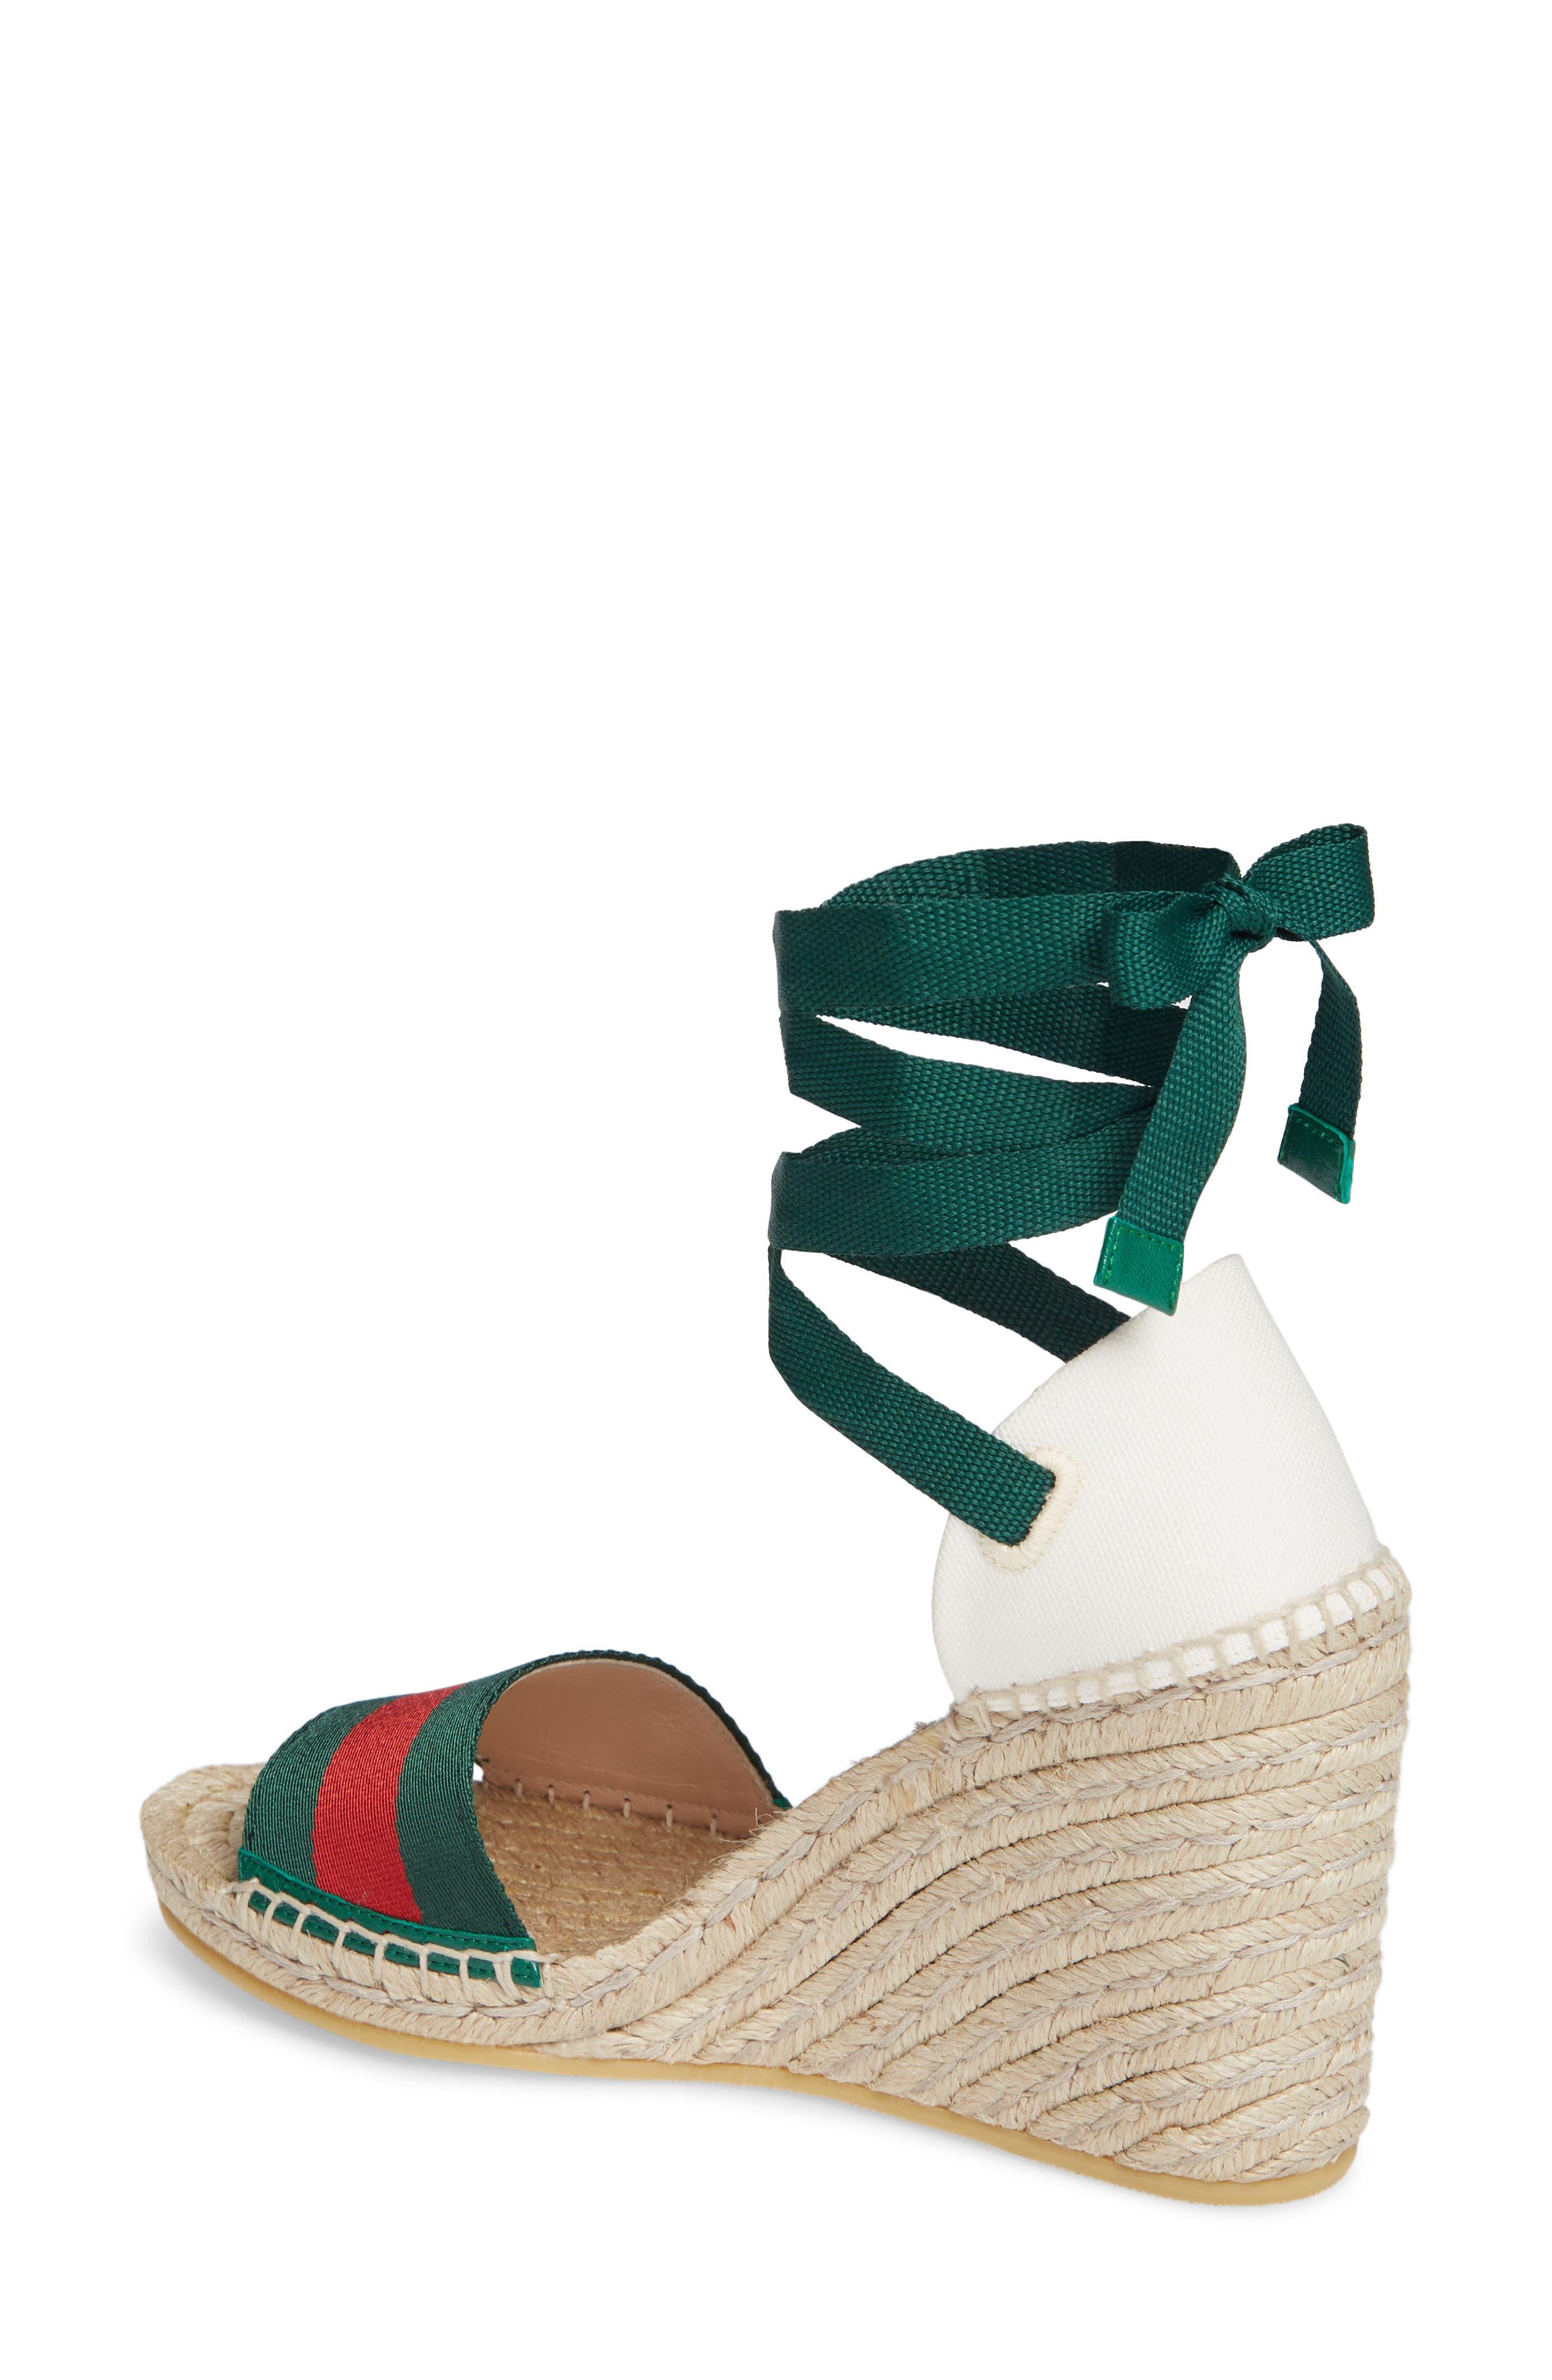 GUCCI, Lilibeth Sylvie Web Espadrille Wedge Sandal, Alternate thumbnail 2, color, WHITE/ GREEN